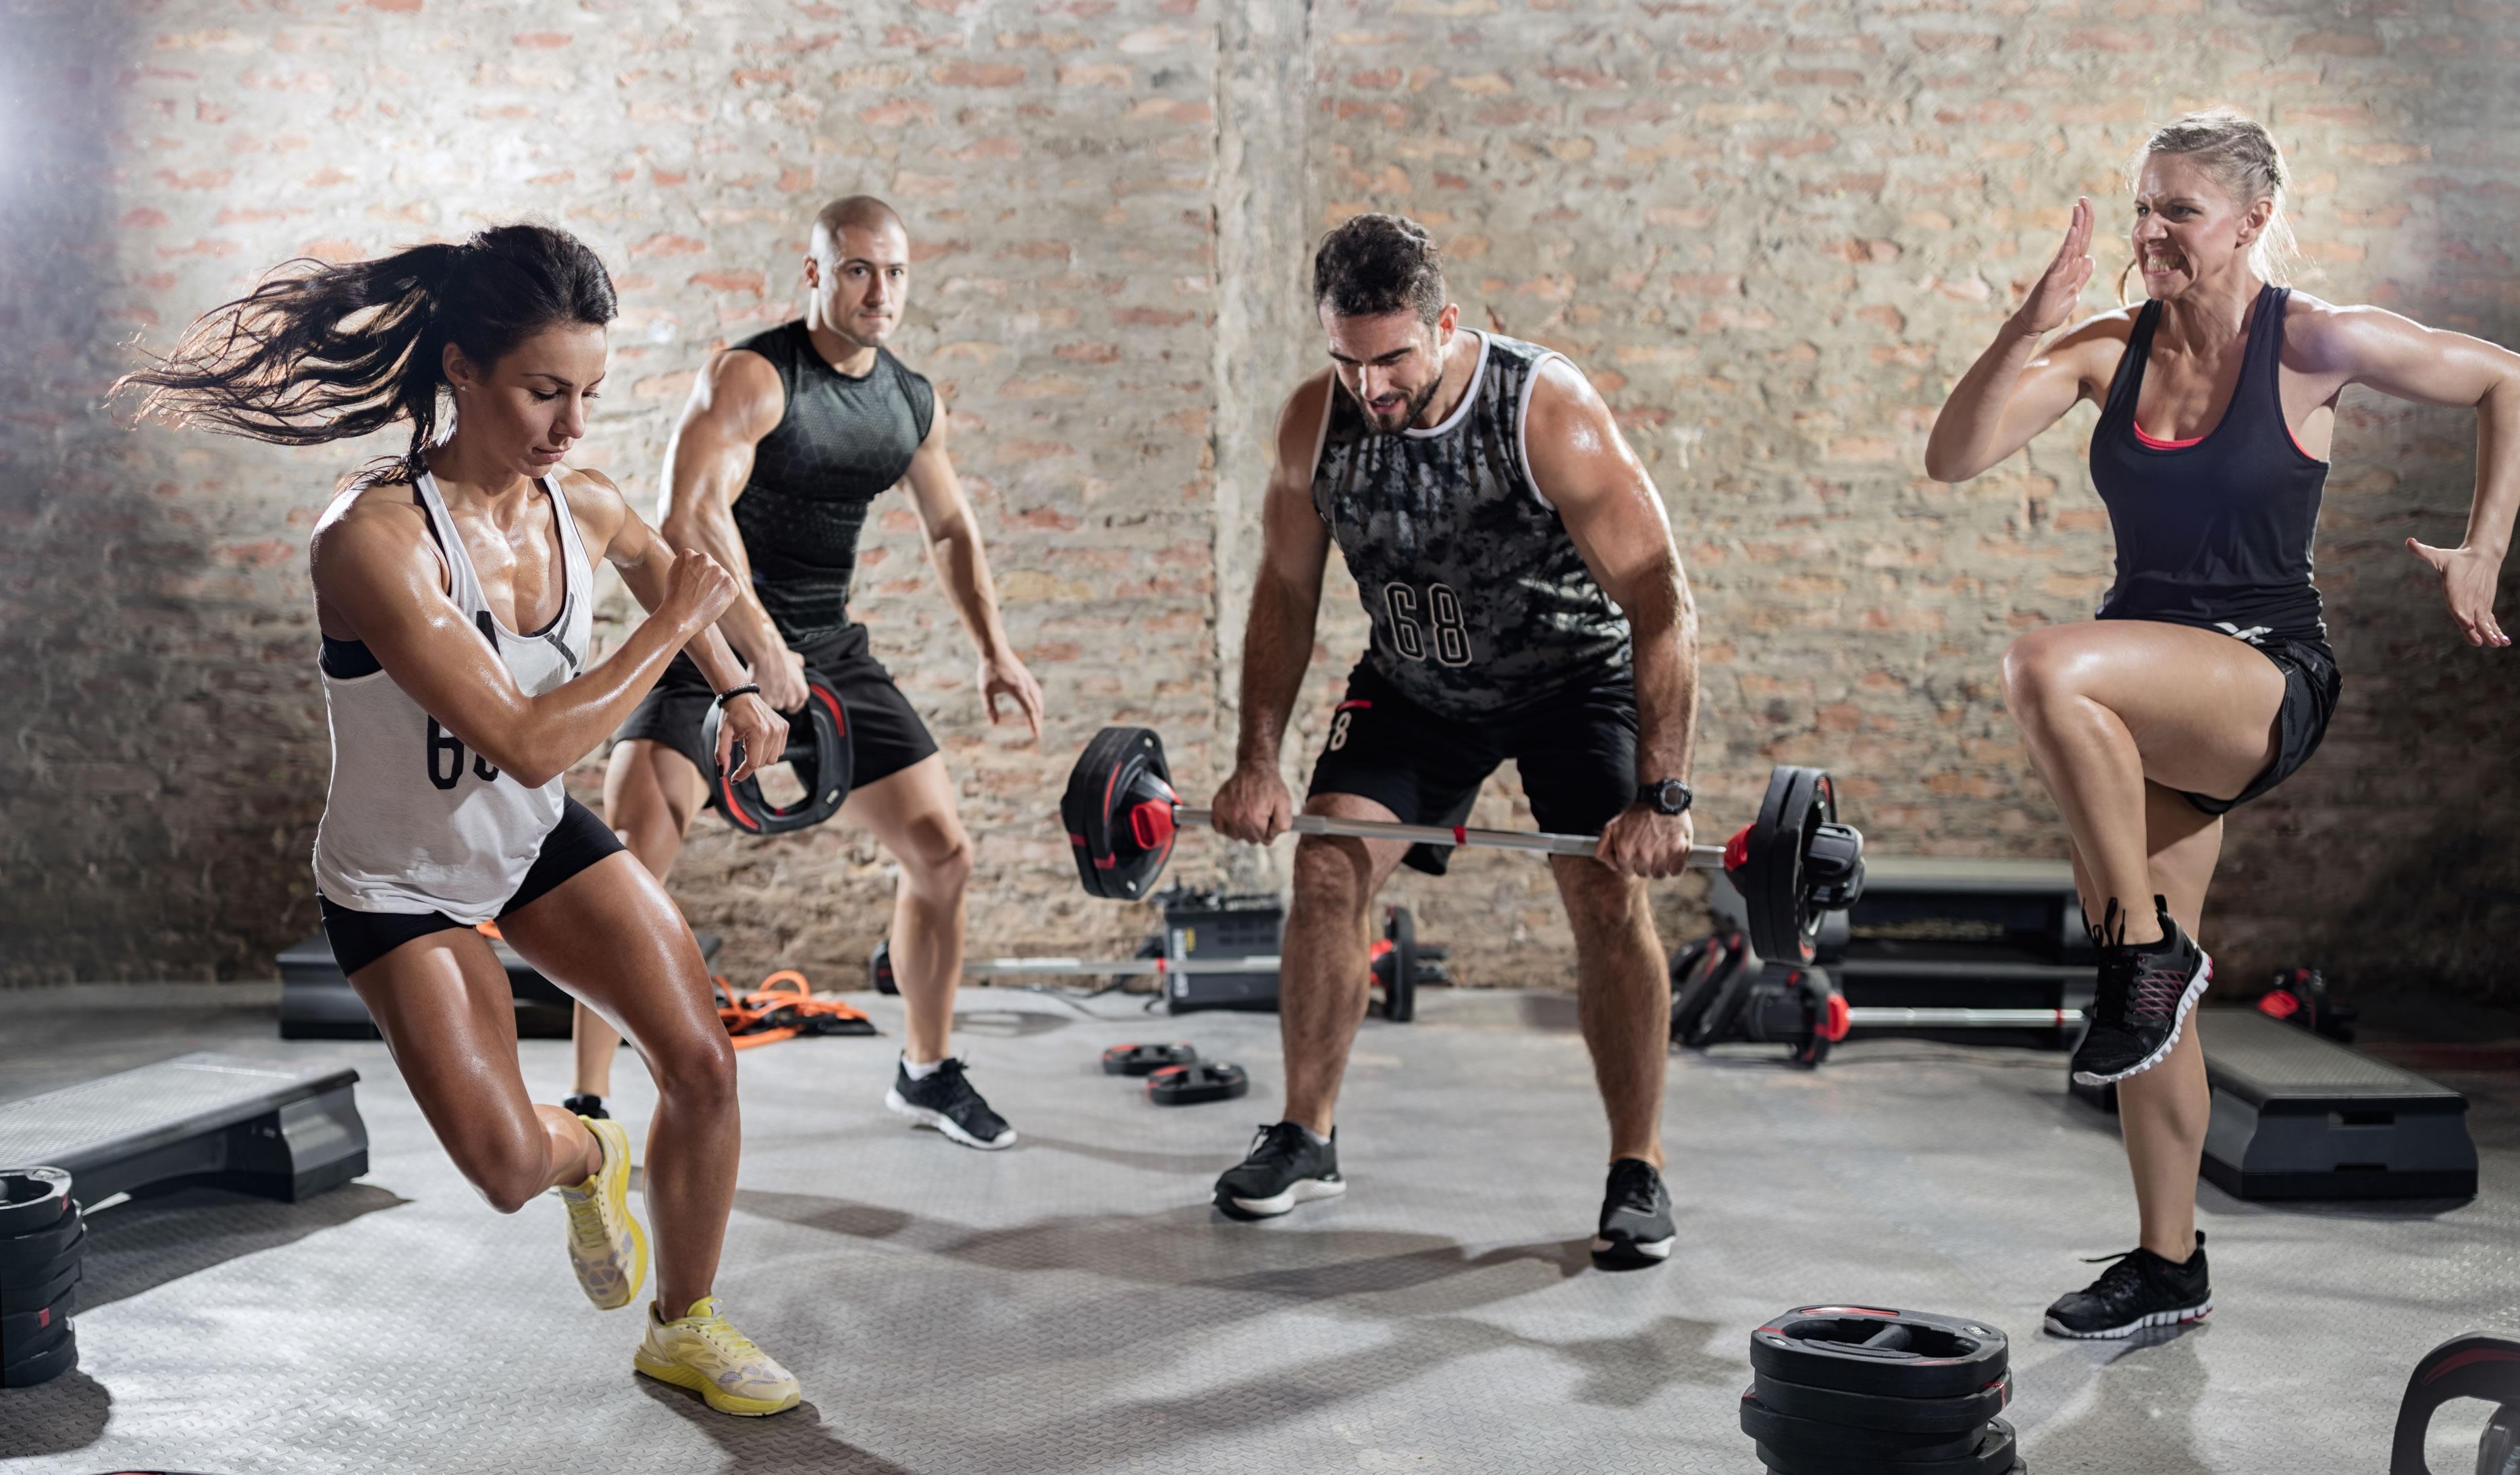 /var/www/html/wp-content/uploads/2018/10/entrenamiento-metabolico-1